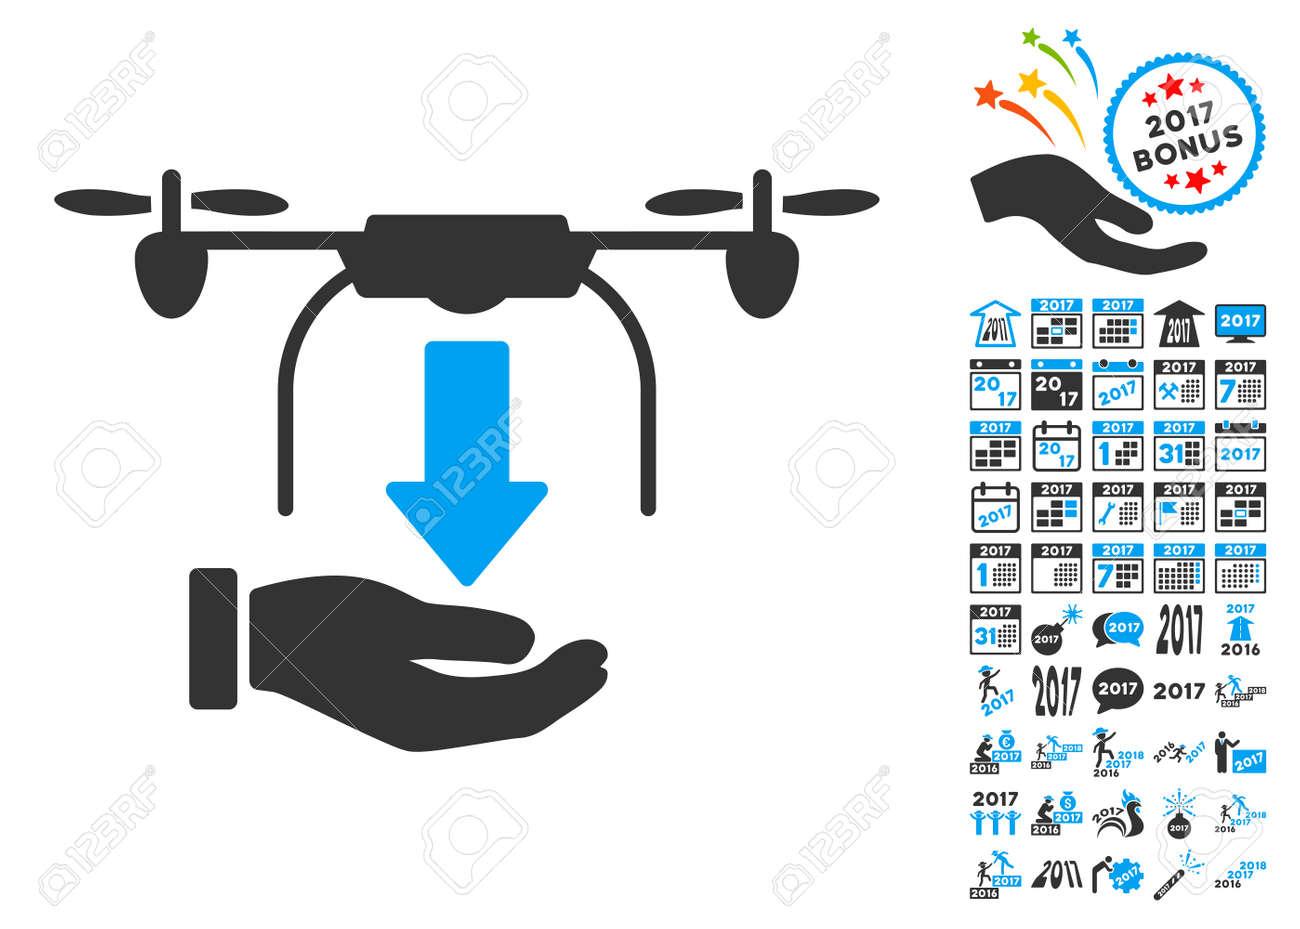 Line Art Illustration Style : Unload drone hand icon with bonus 2017 new year clip art. glyph